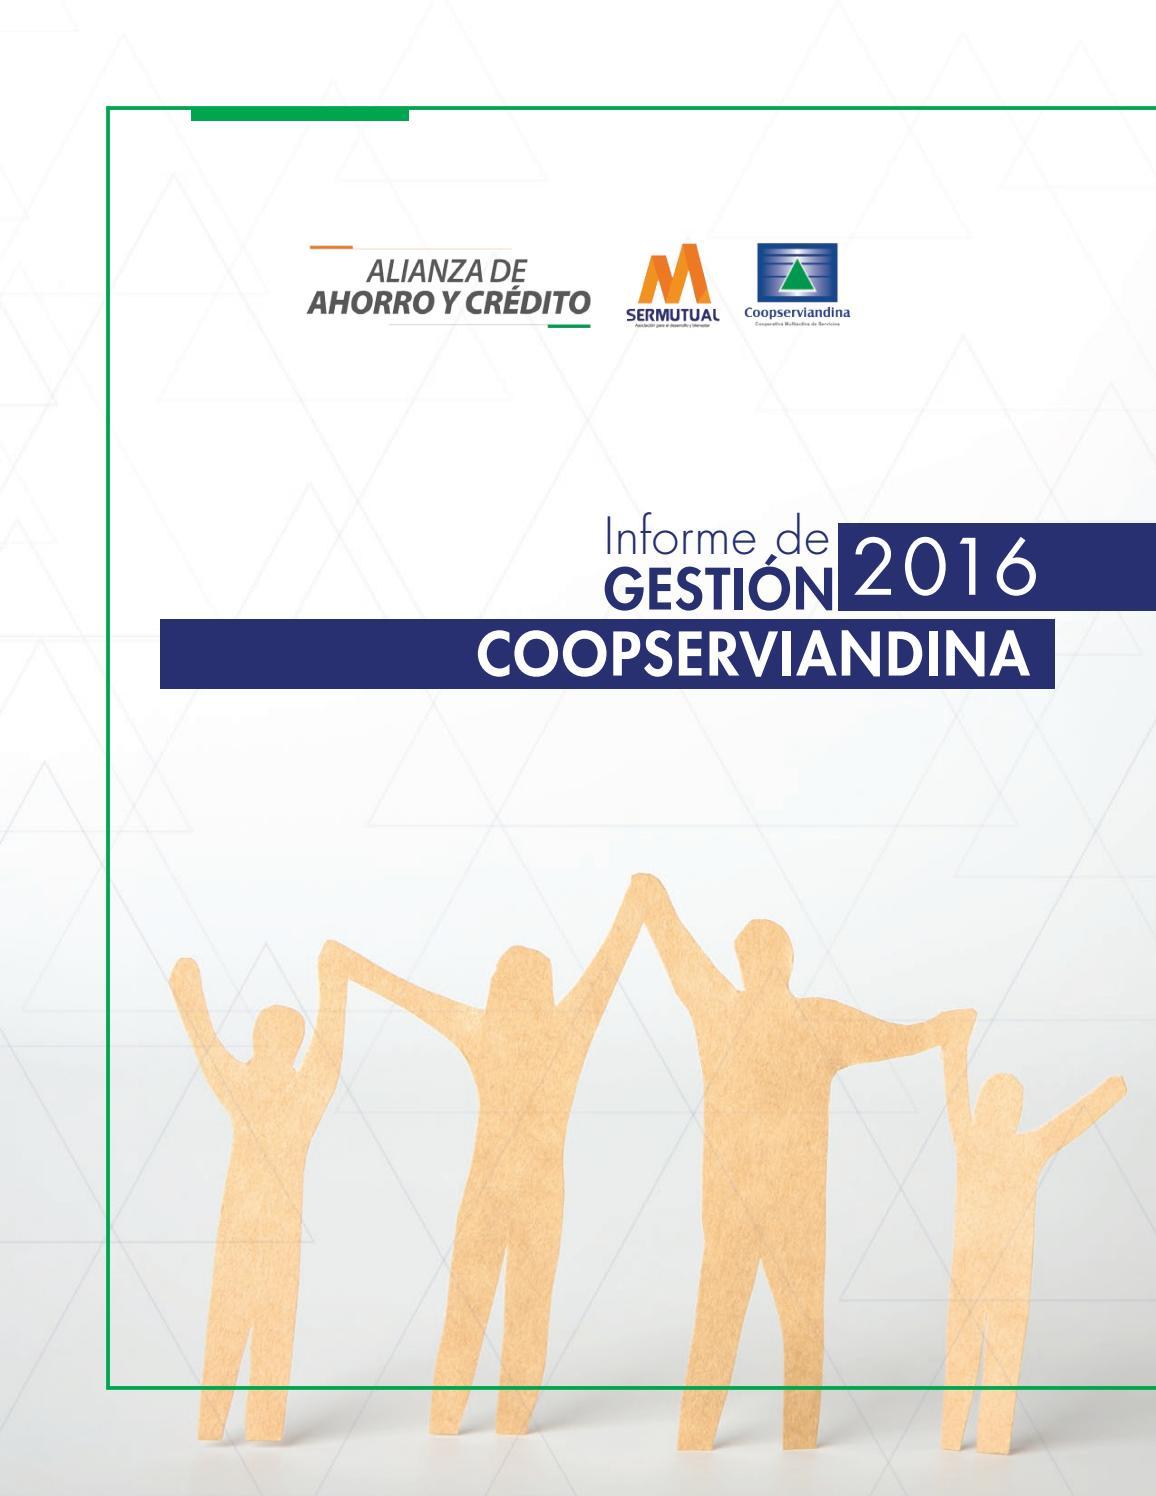 Informe De Gesti N 2016 Coopserviandina By Martin Brand Gesti N  # Muebles Roldan Tulua